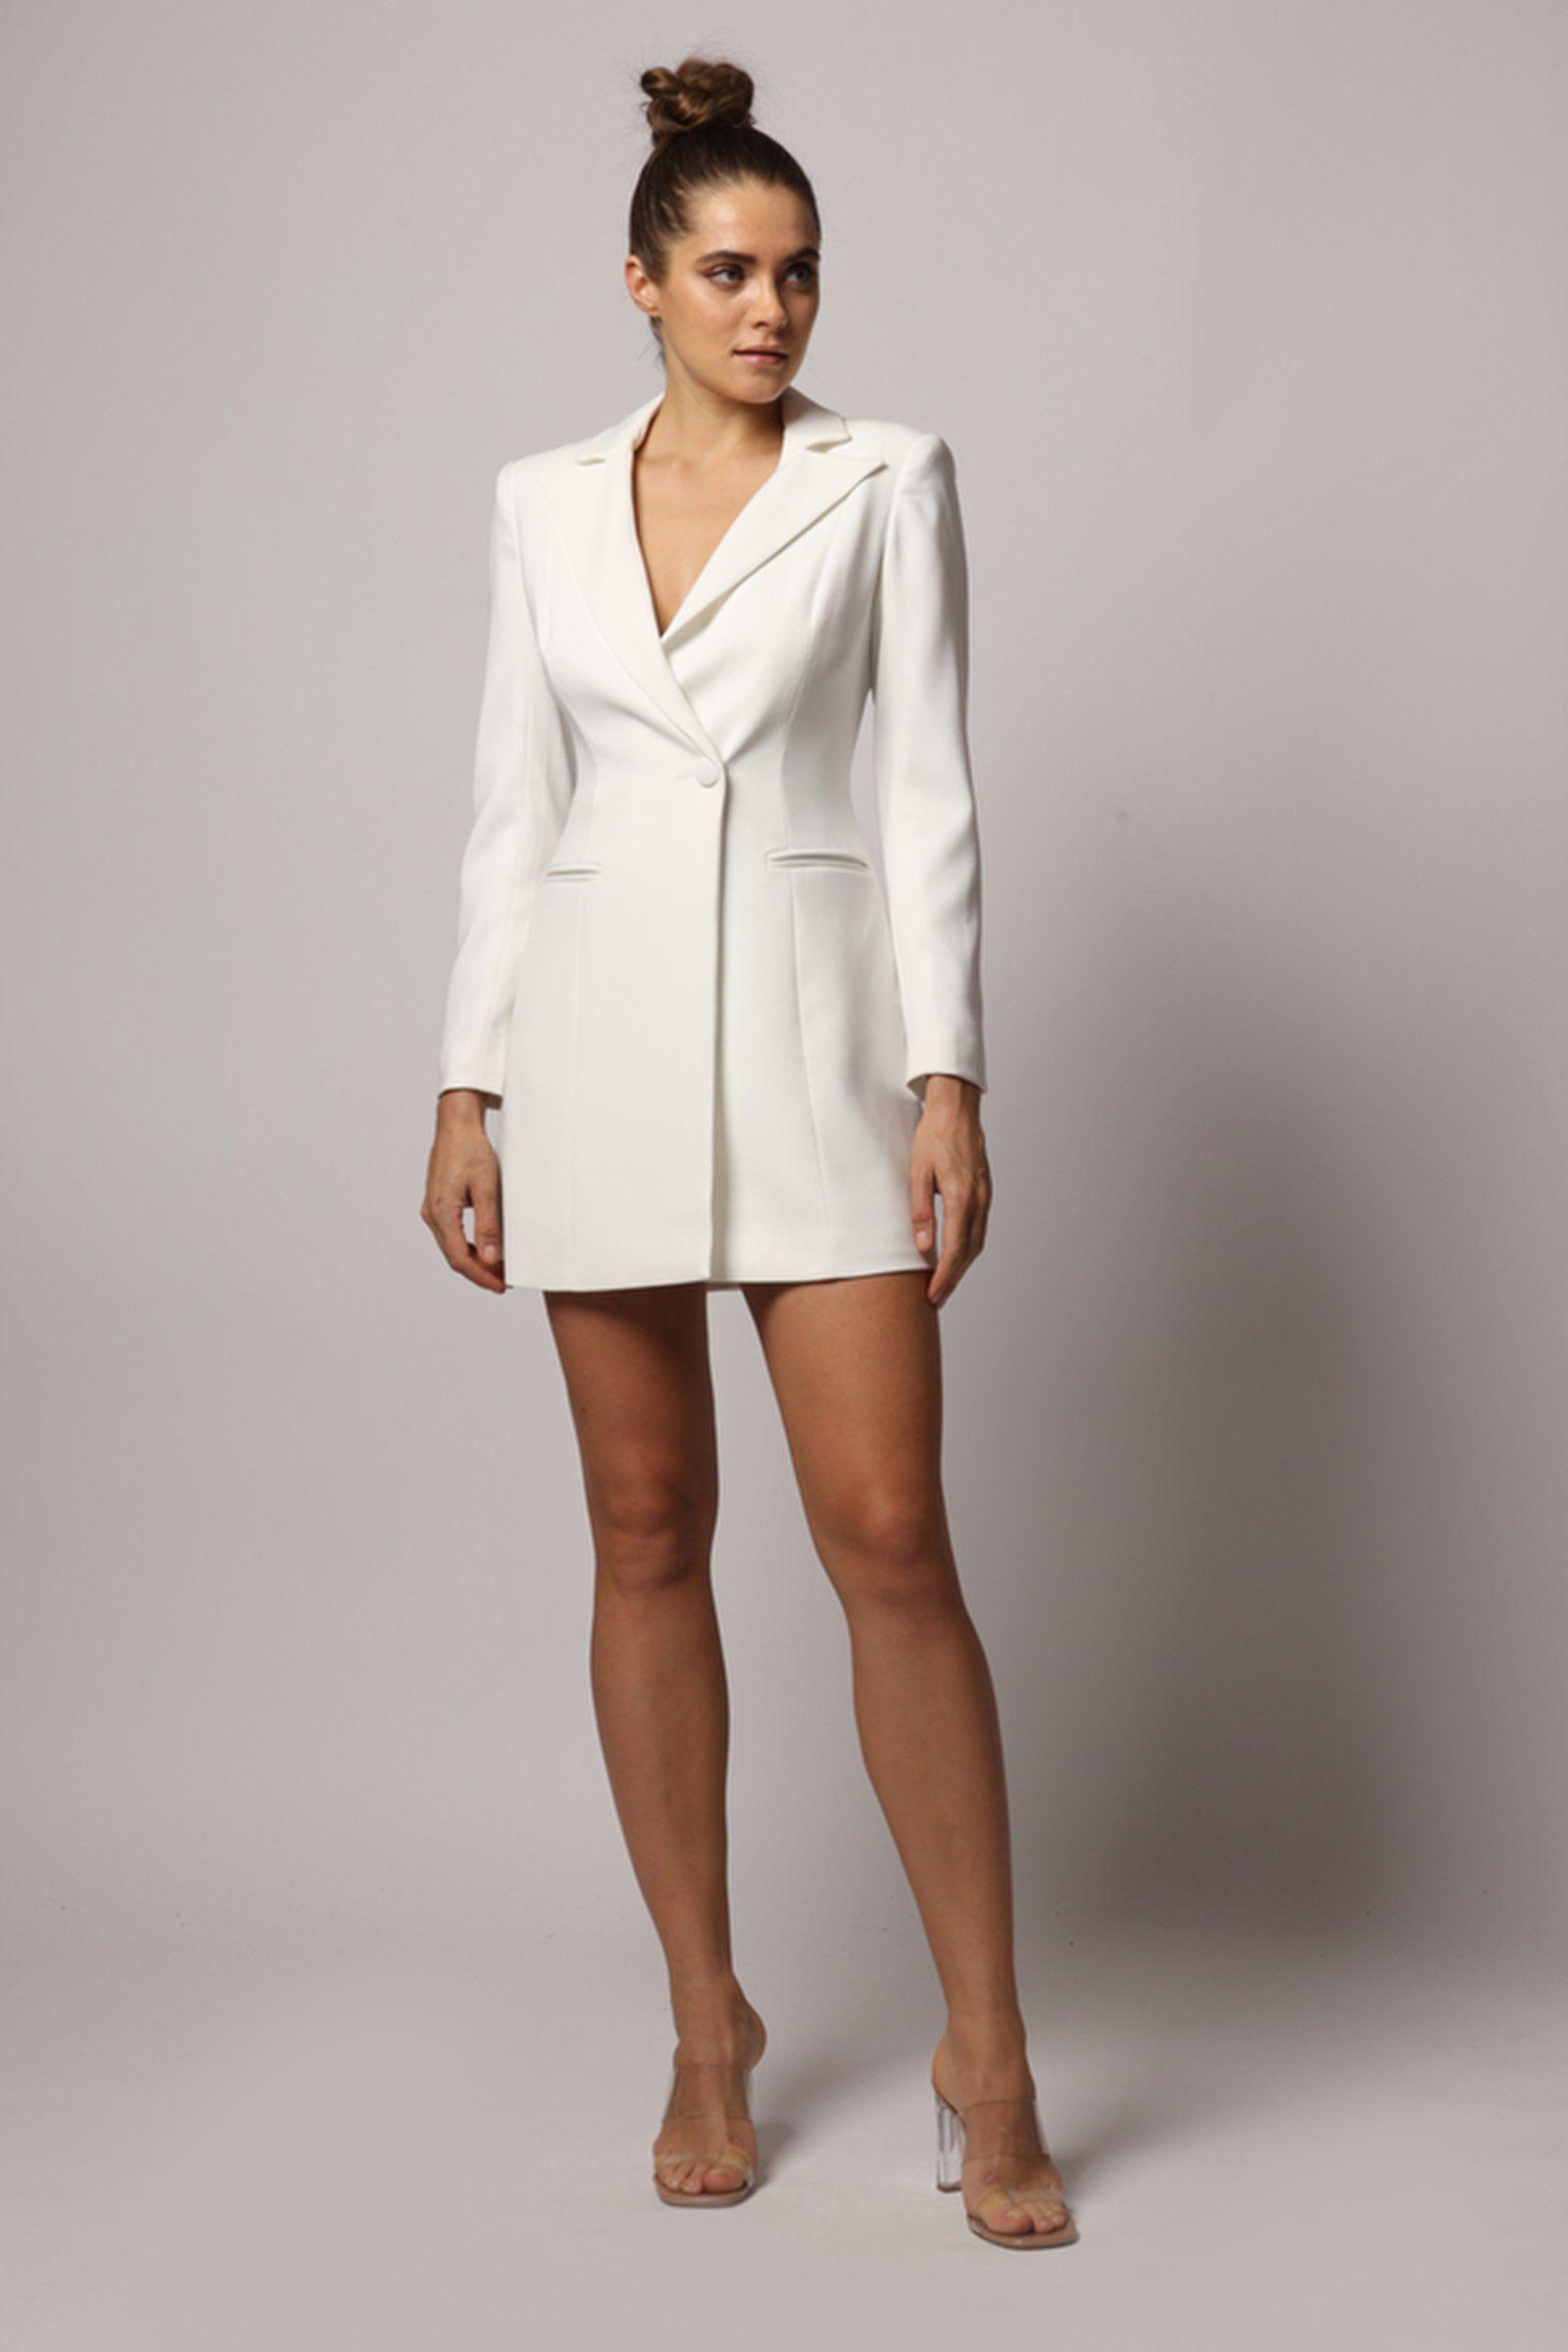 Ace Mini Dress Tuxedo Dress White Dresses Blazer Dress [ 2400 x 1600 Pixel ]